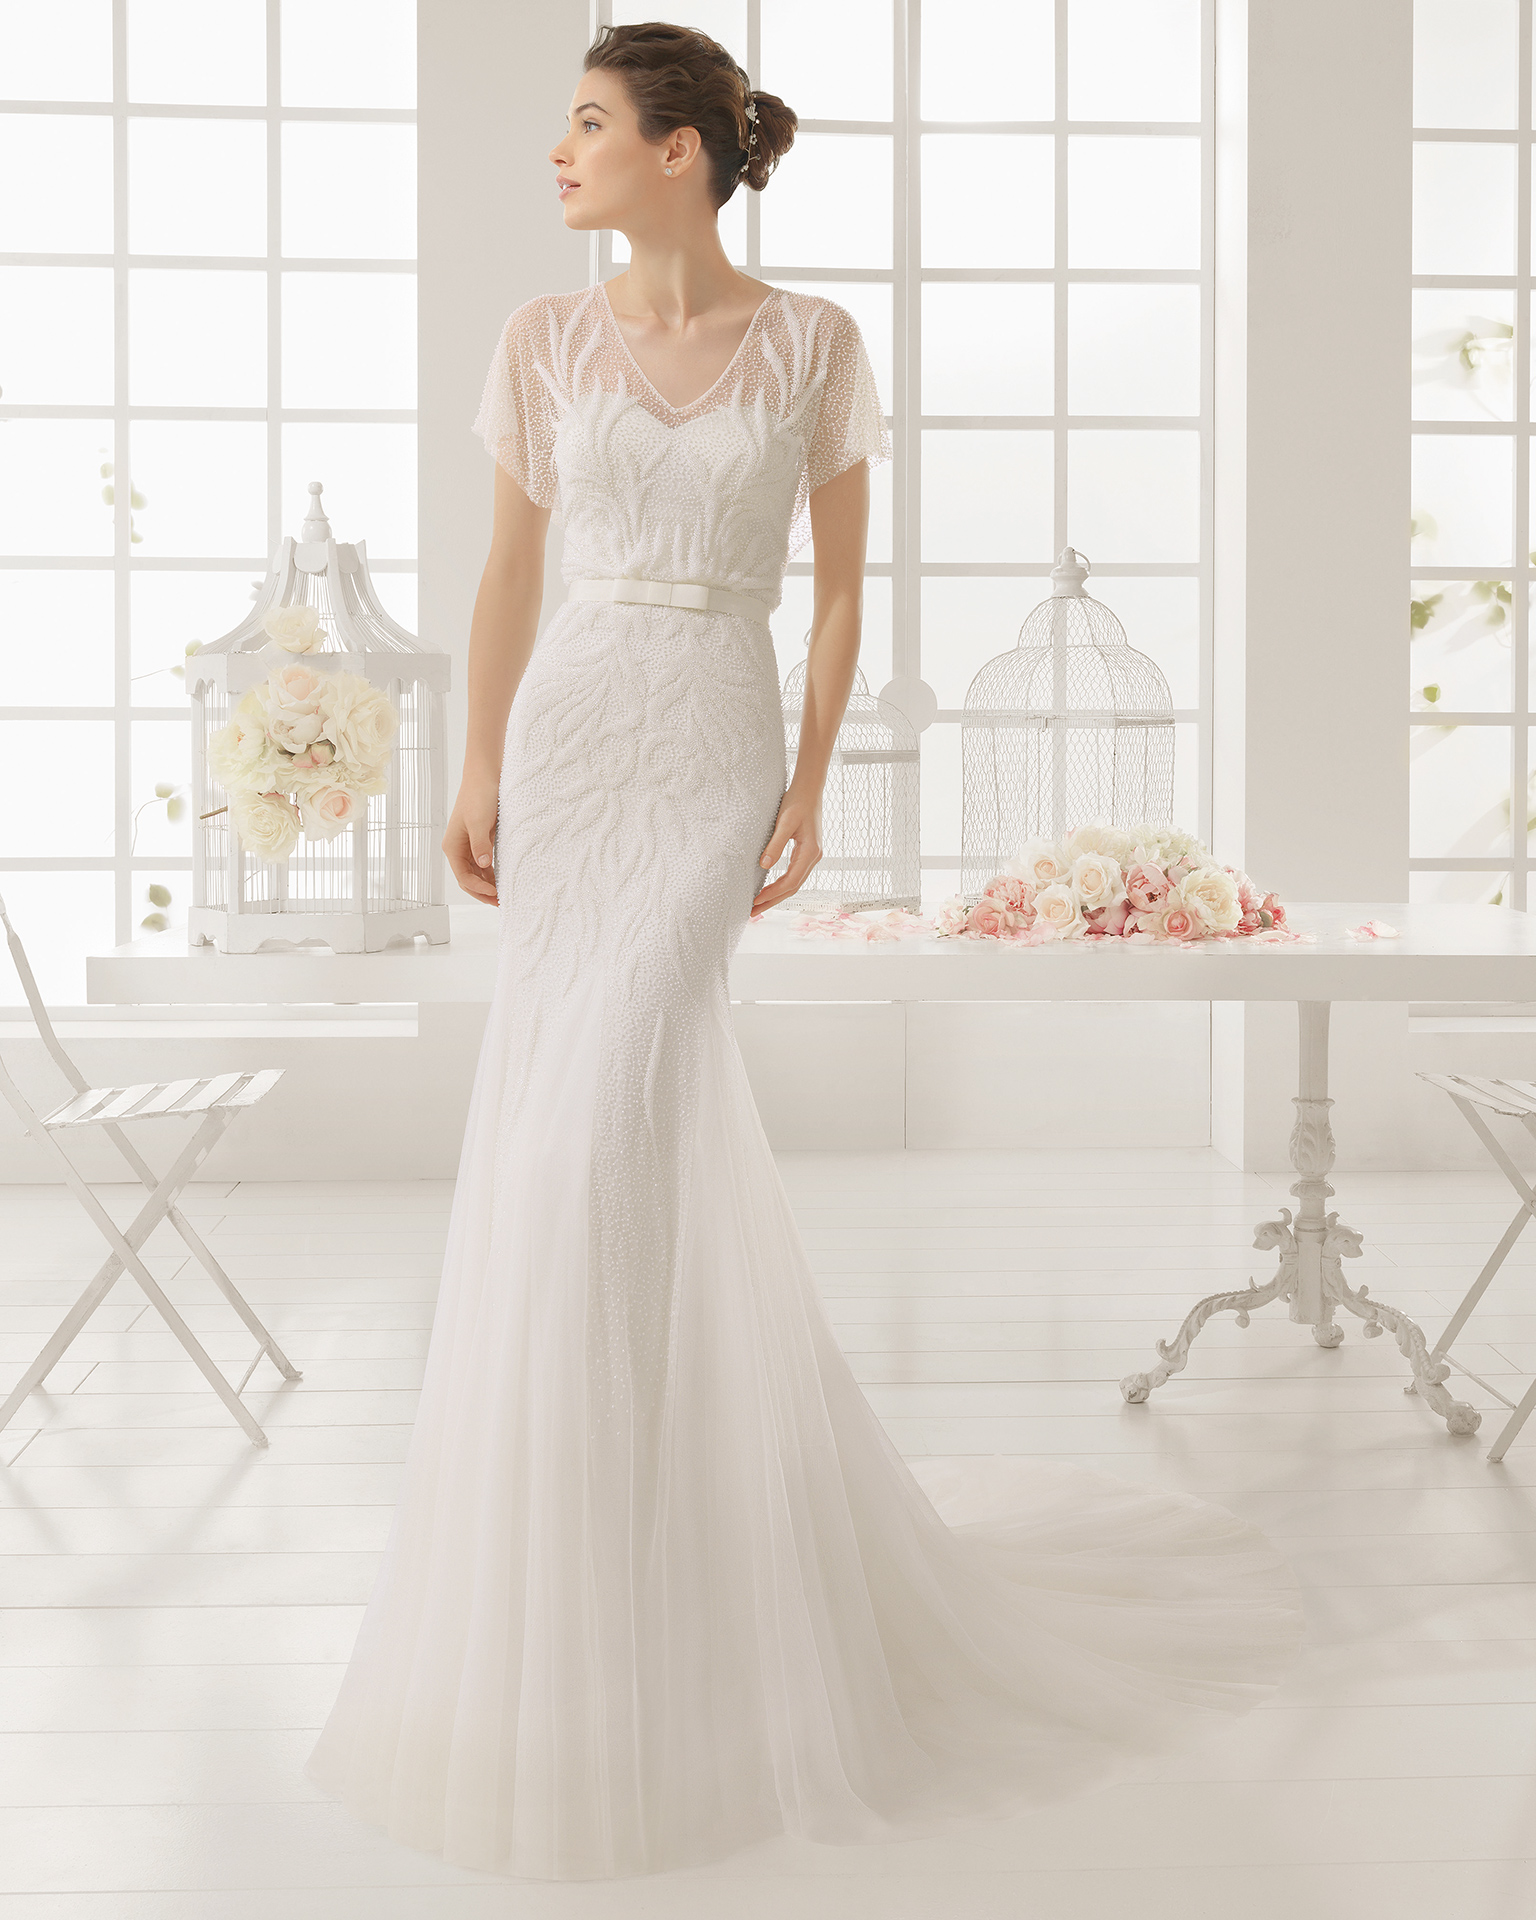 MADIAN beaded tulle wedding dress.